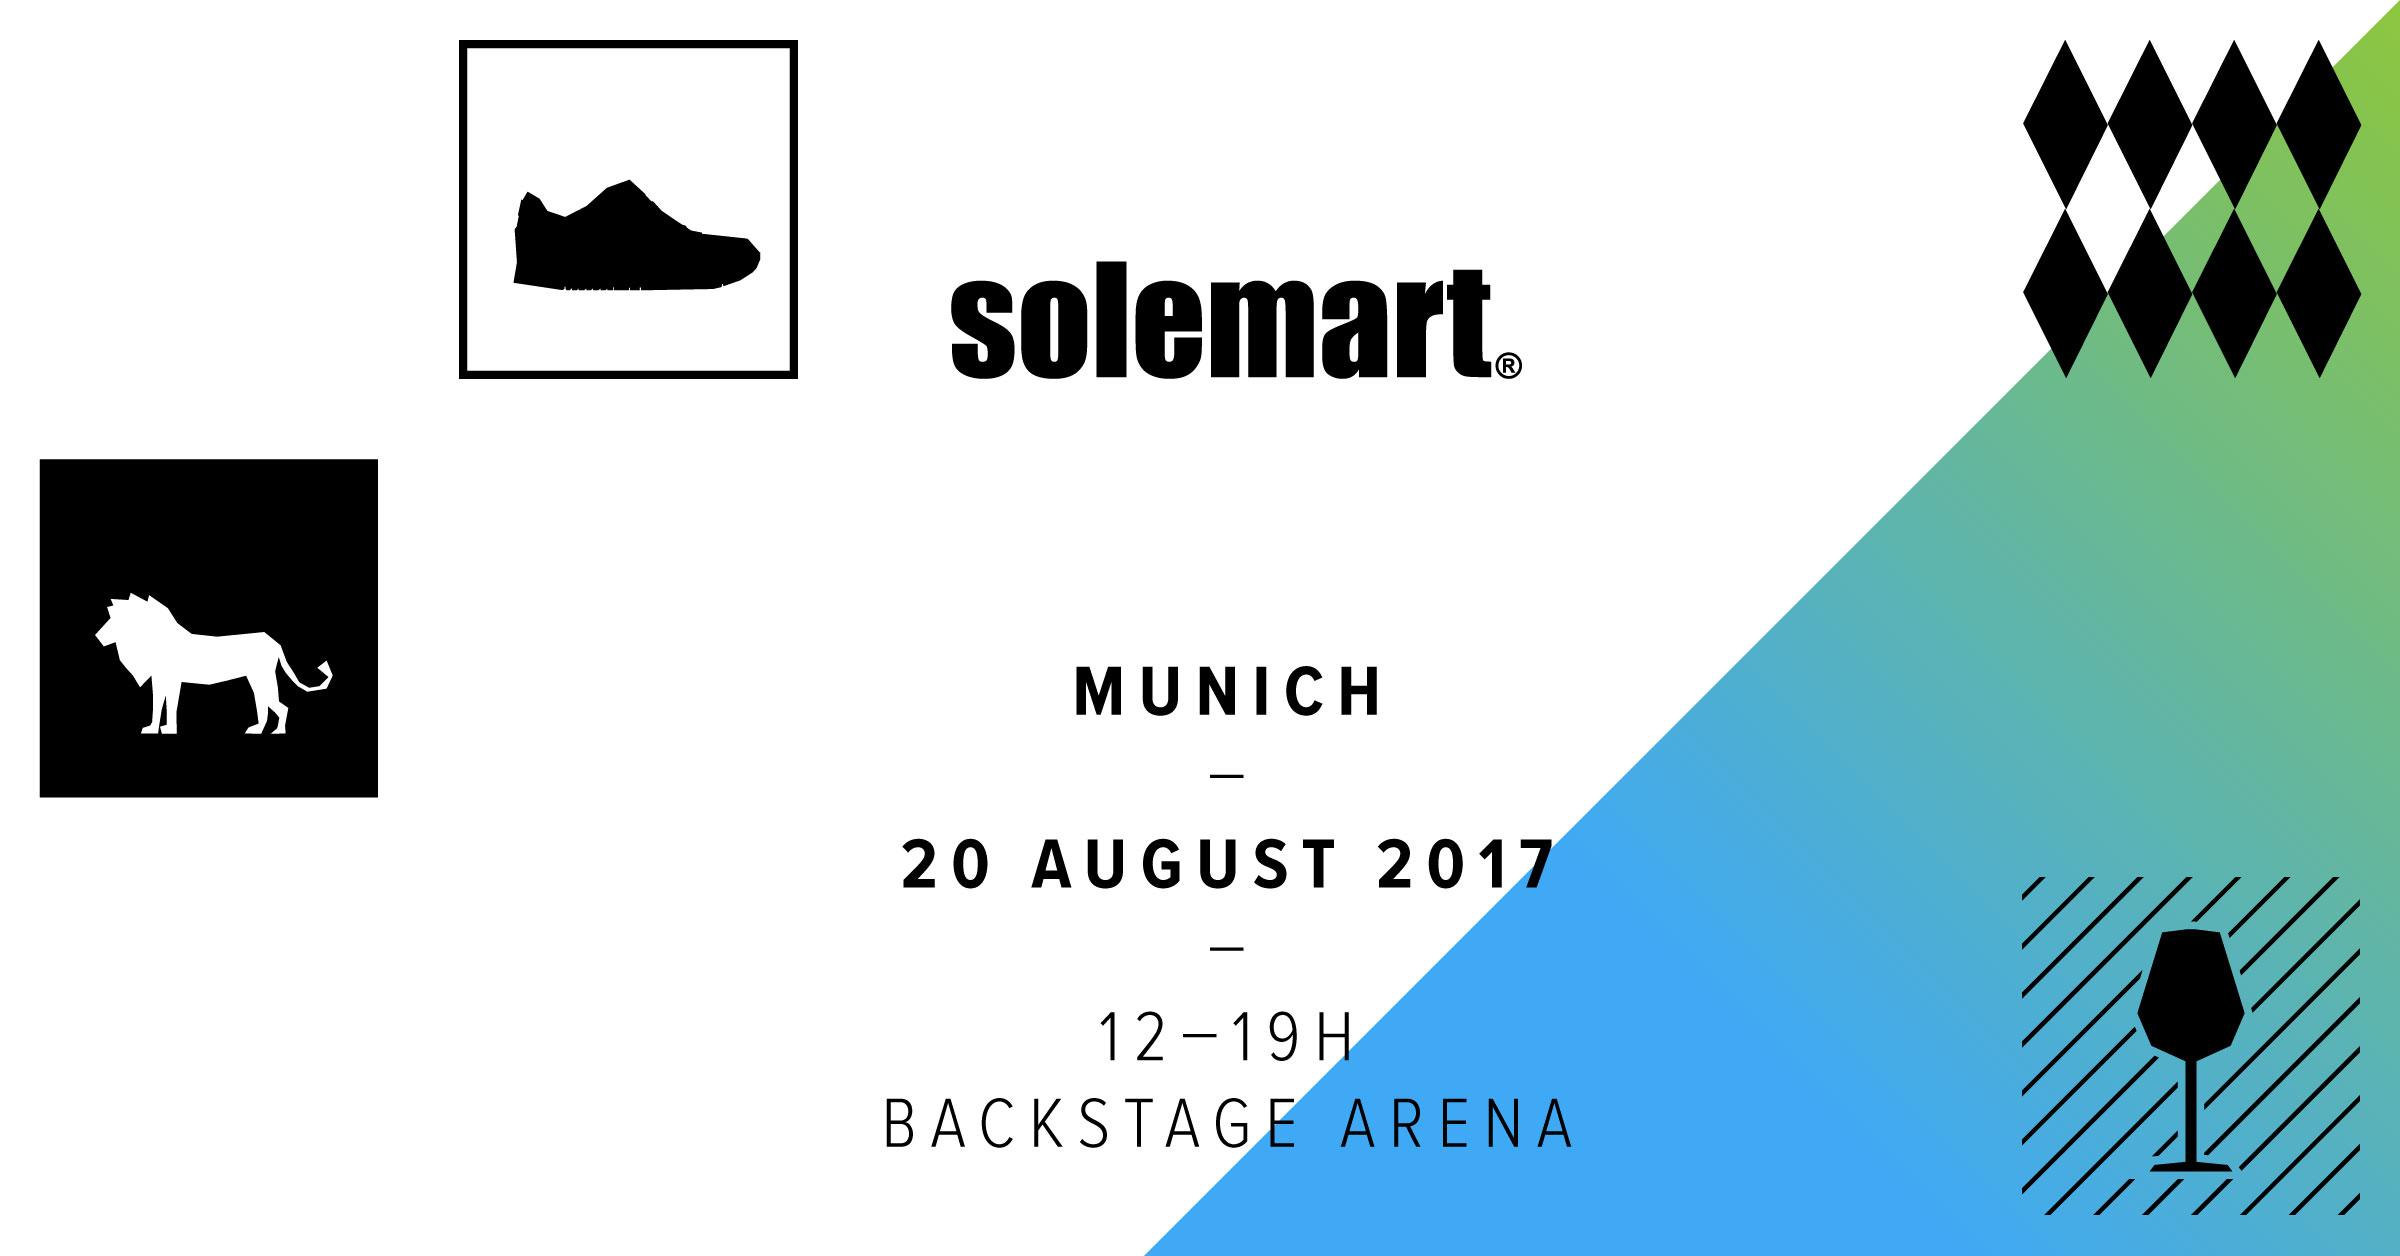 solemart_mu_2017_3-fbevent